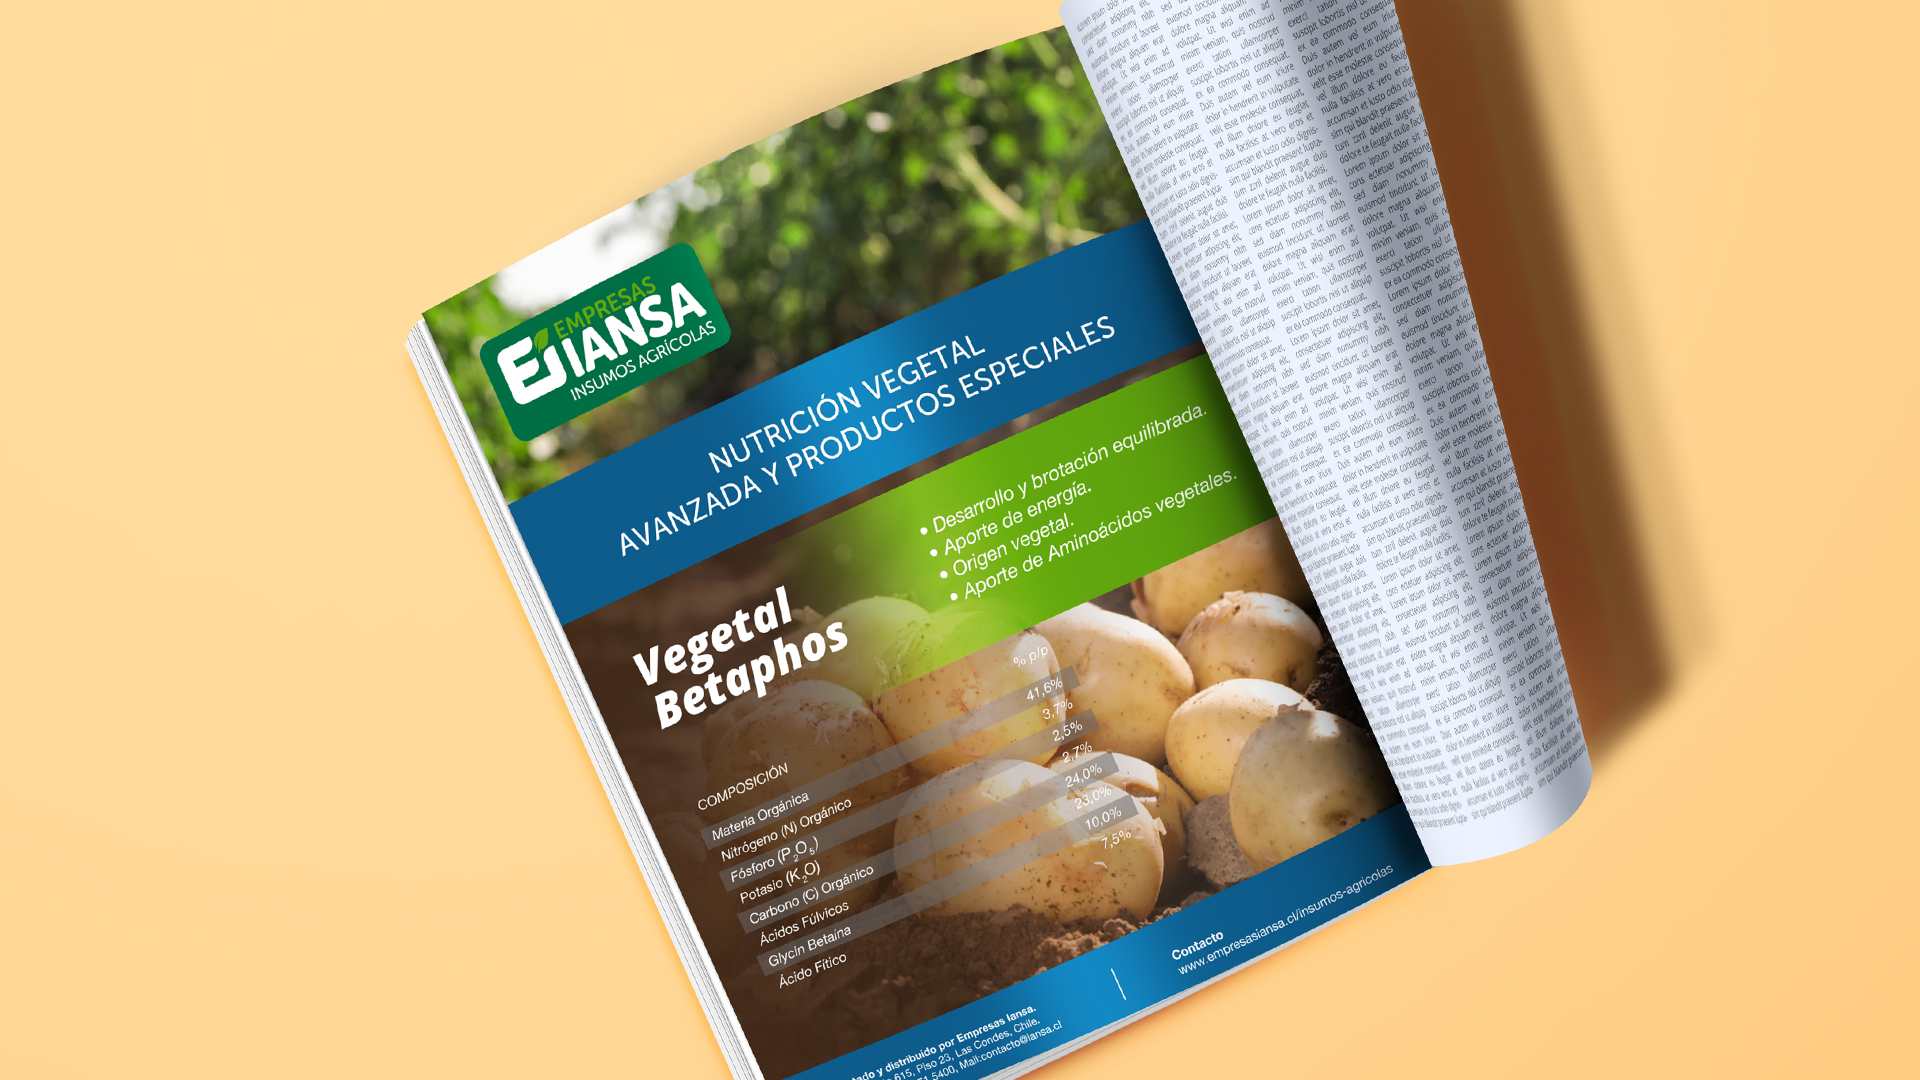 Aviso-Vegetal-Betaphos